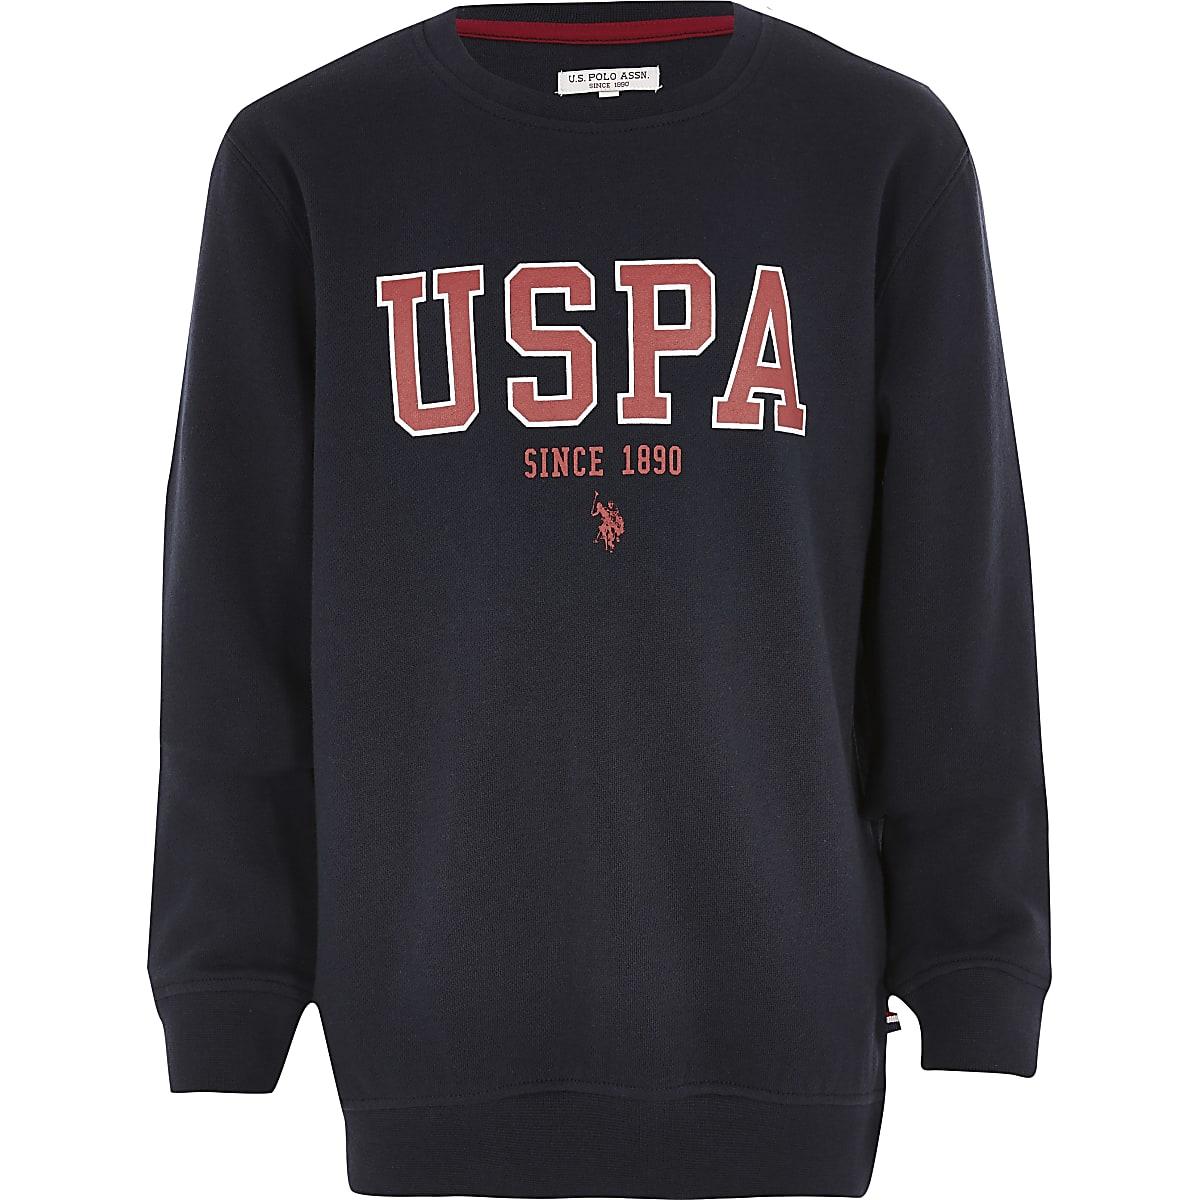 Boys U.S. Polo Assn. navy branded sweatshirt